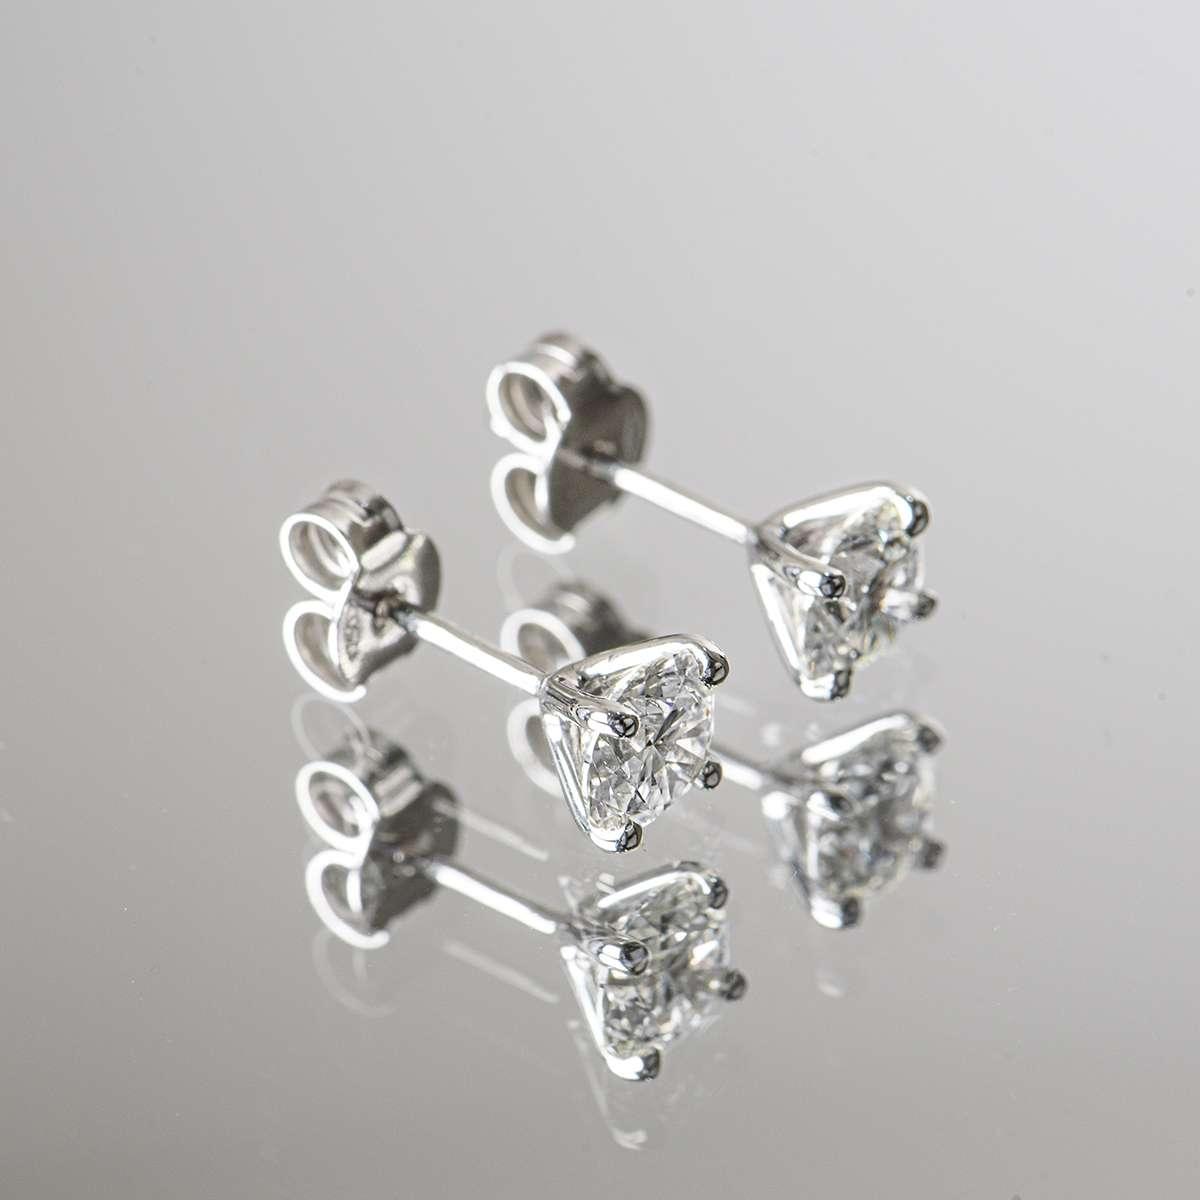 White Gold Round Brilliant Cut Diamond Earrings 1.49ct TDW